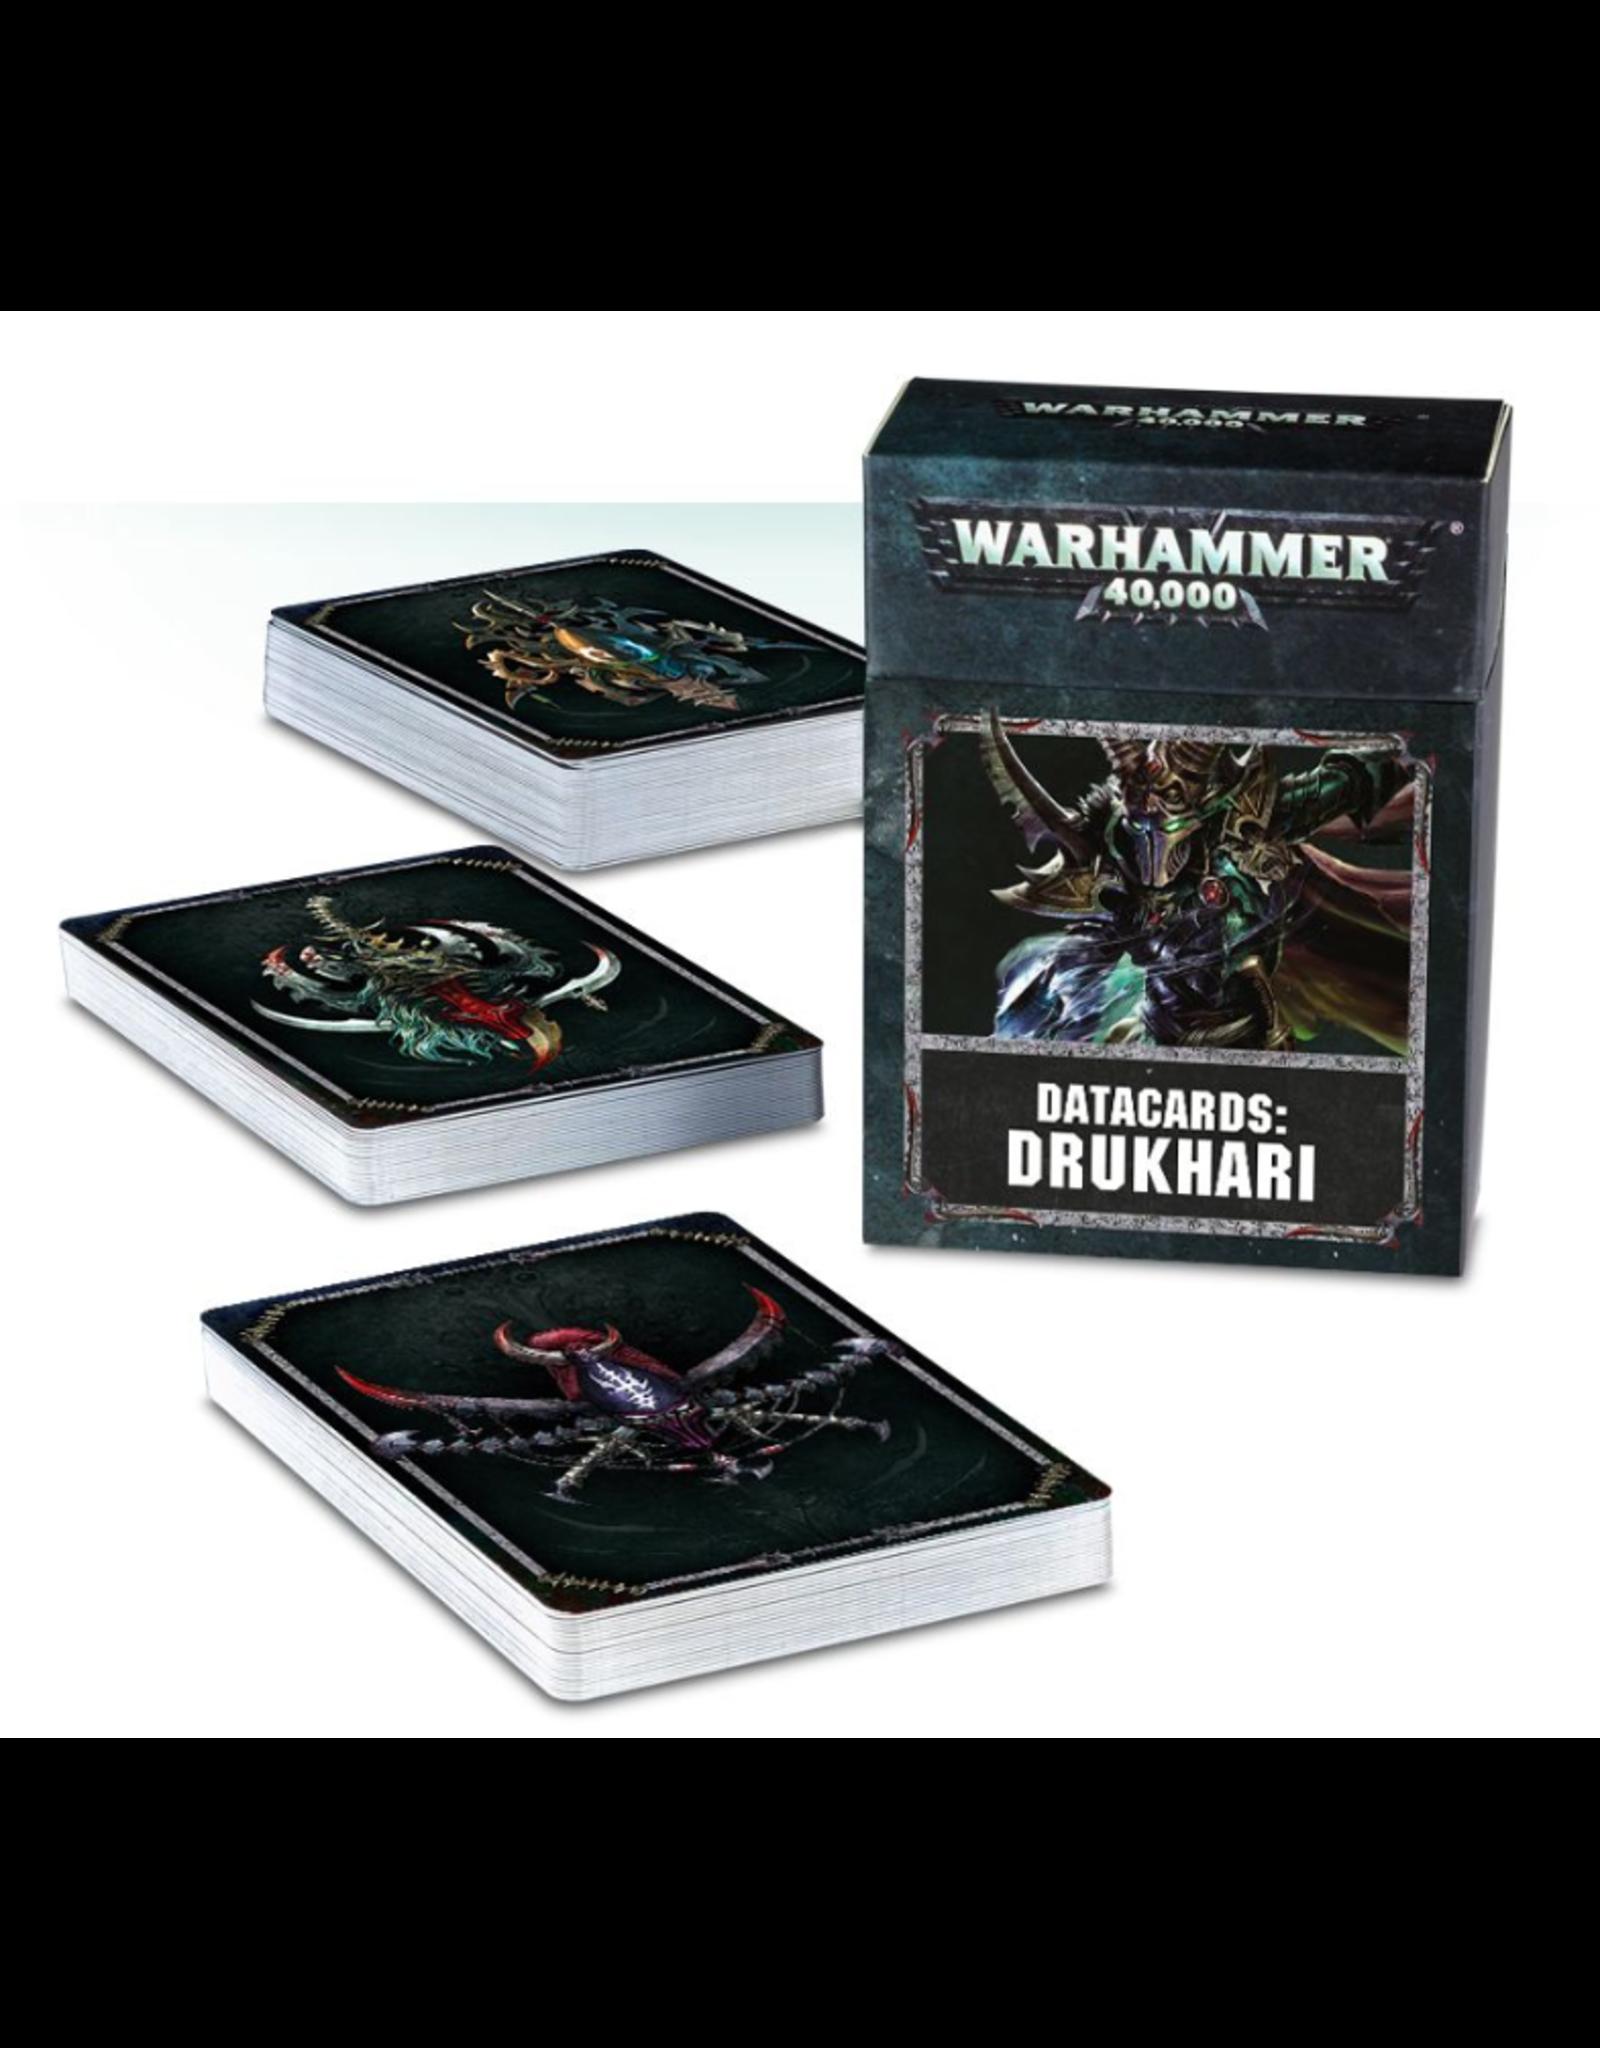 Warhammer 40K Datacards Drukhari